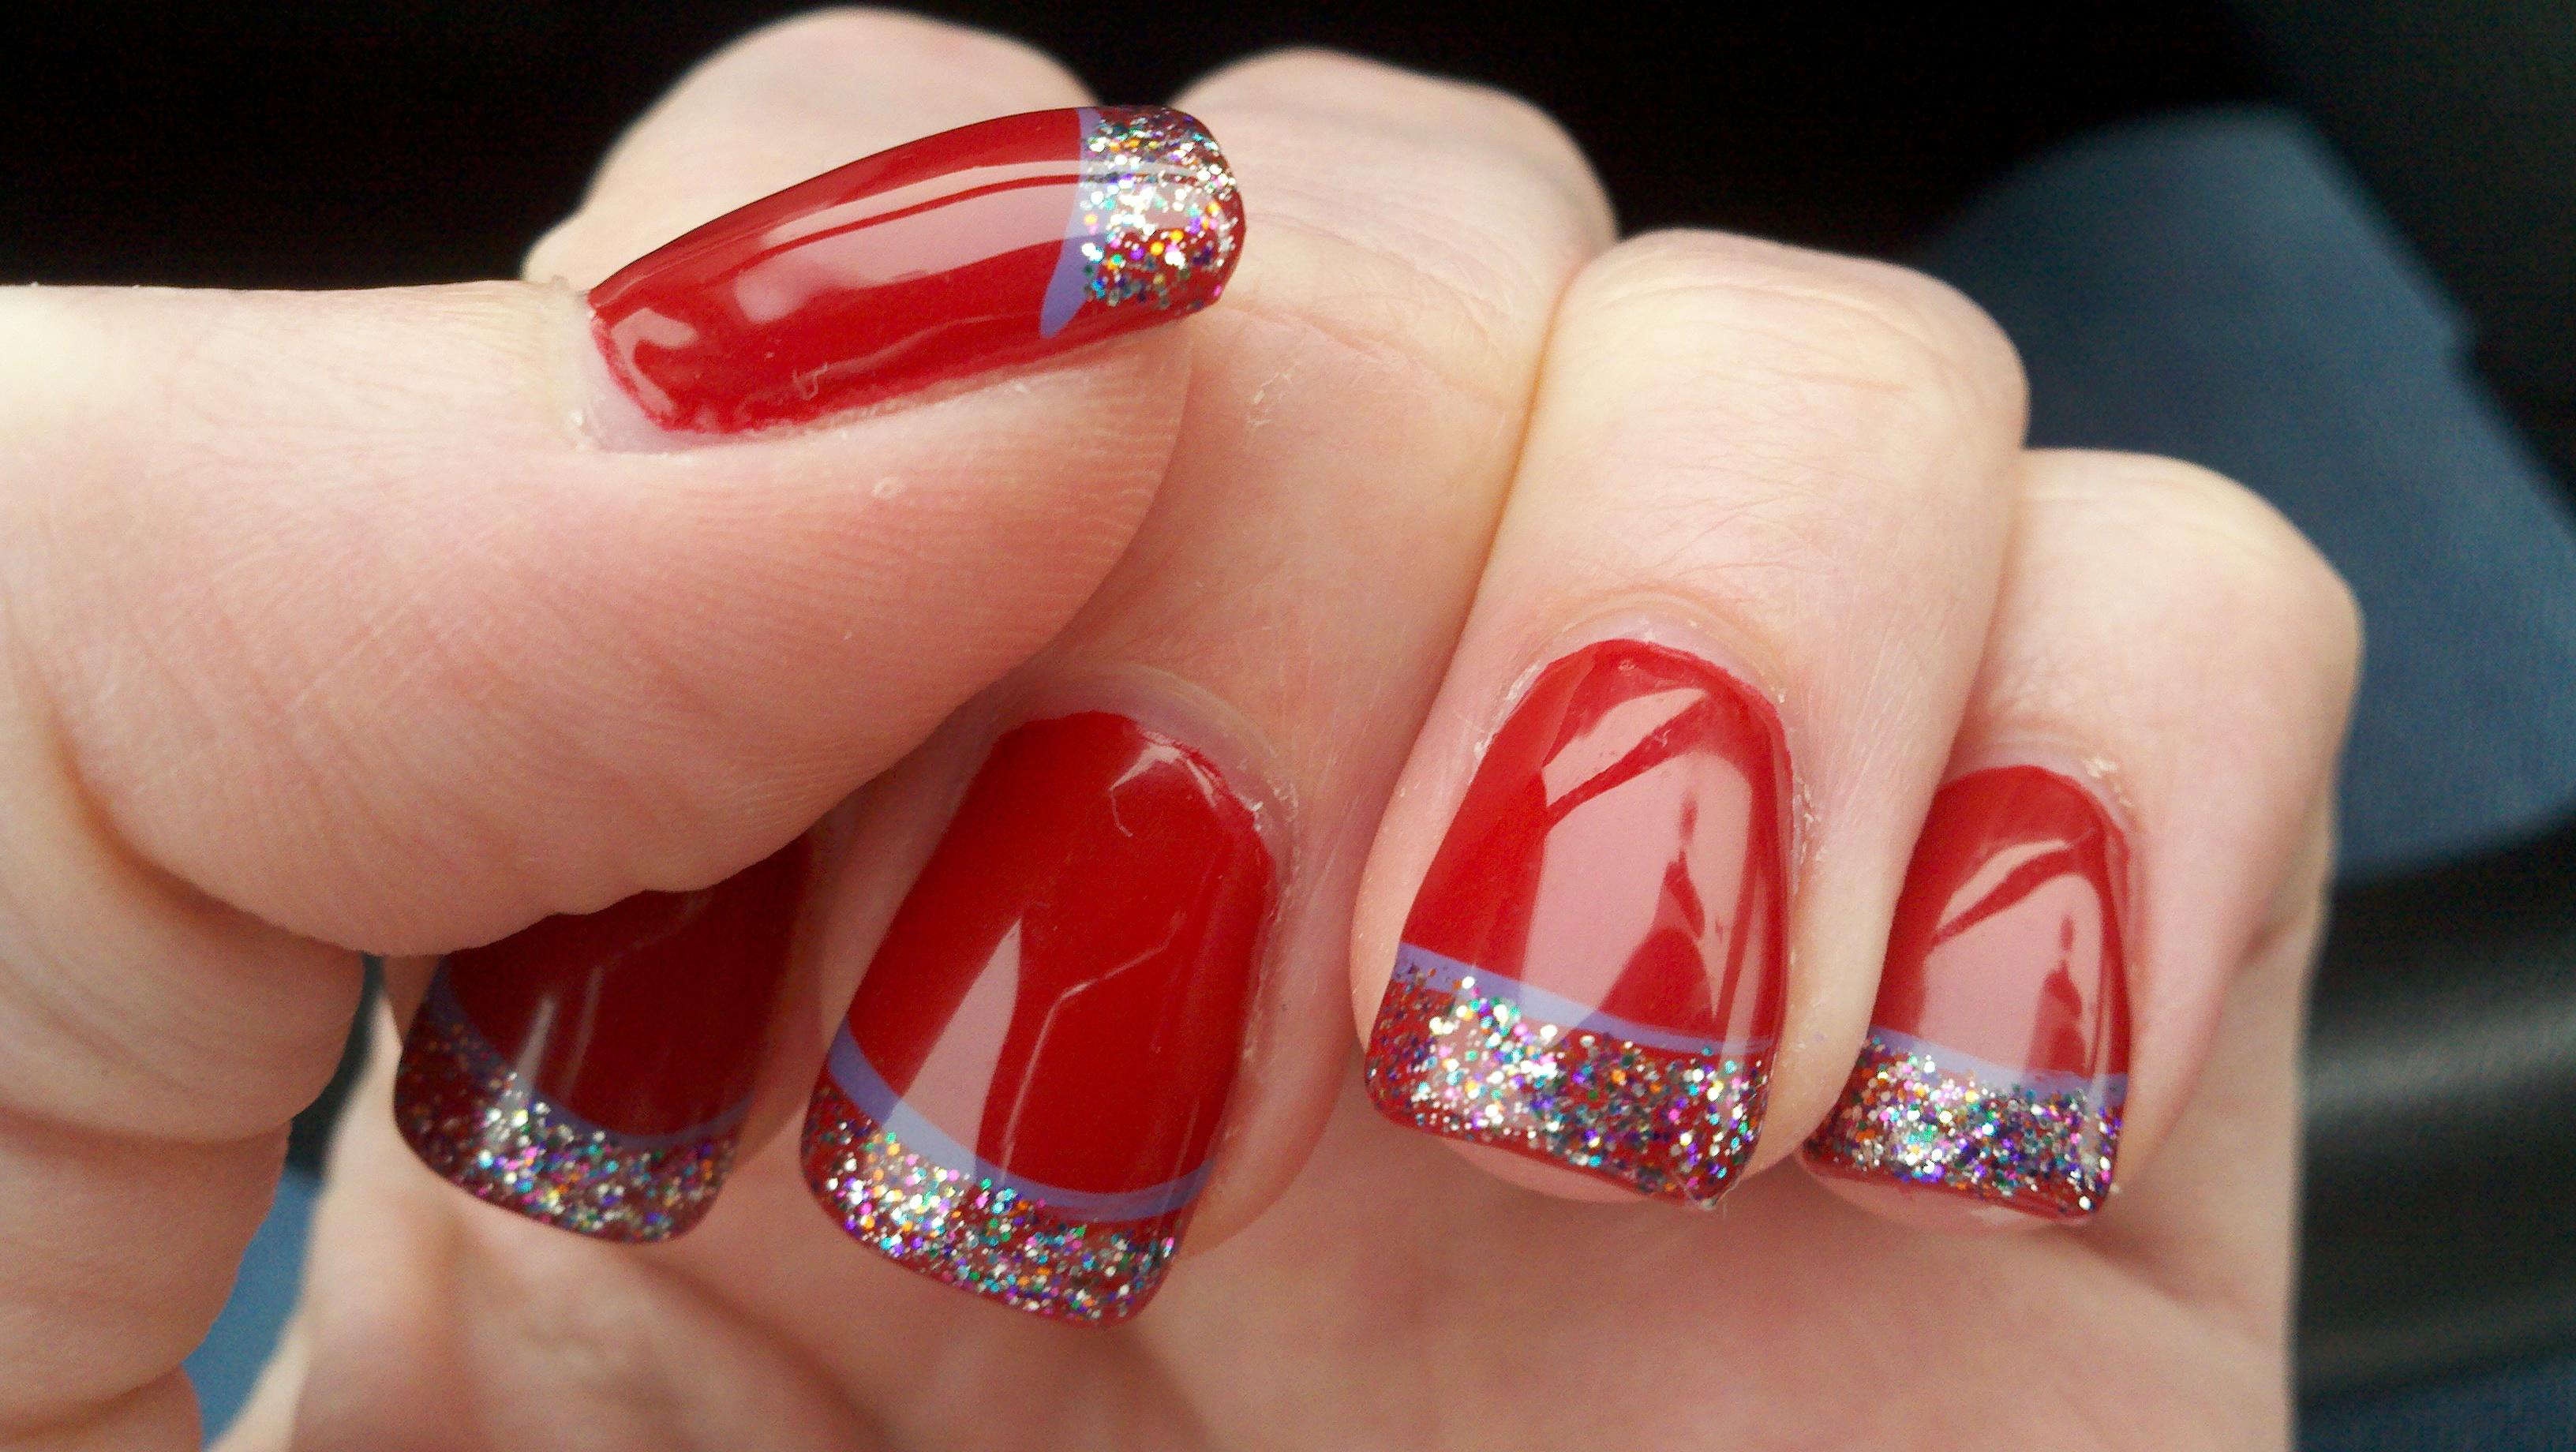 Red Christmas Nail Art 3264x1840